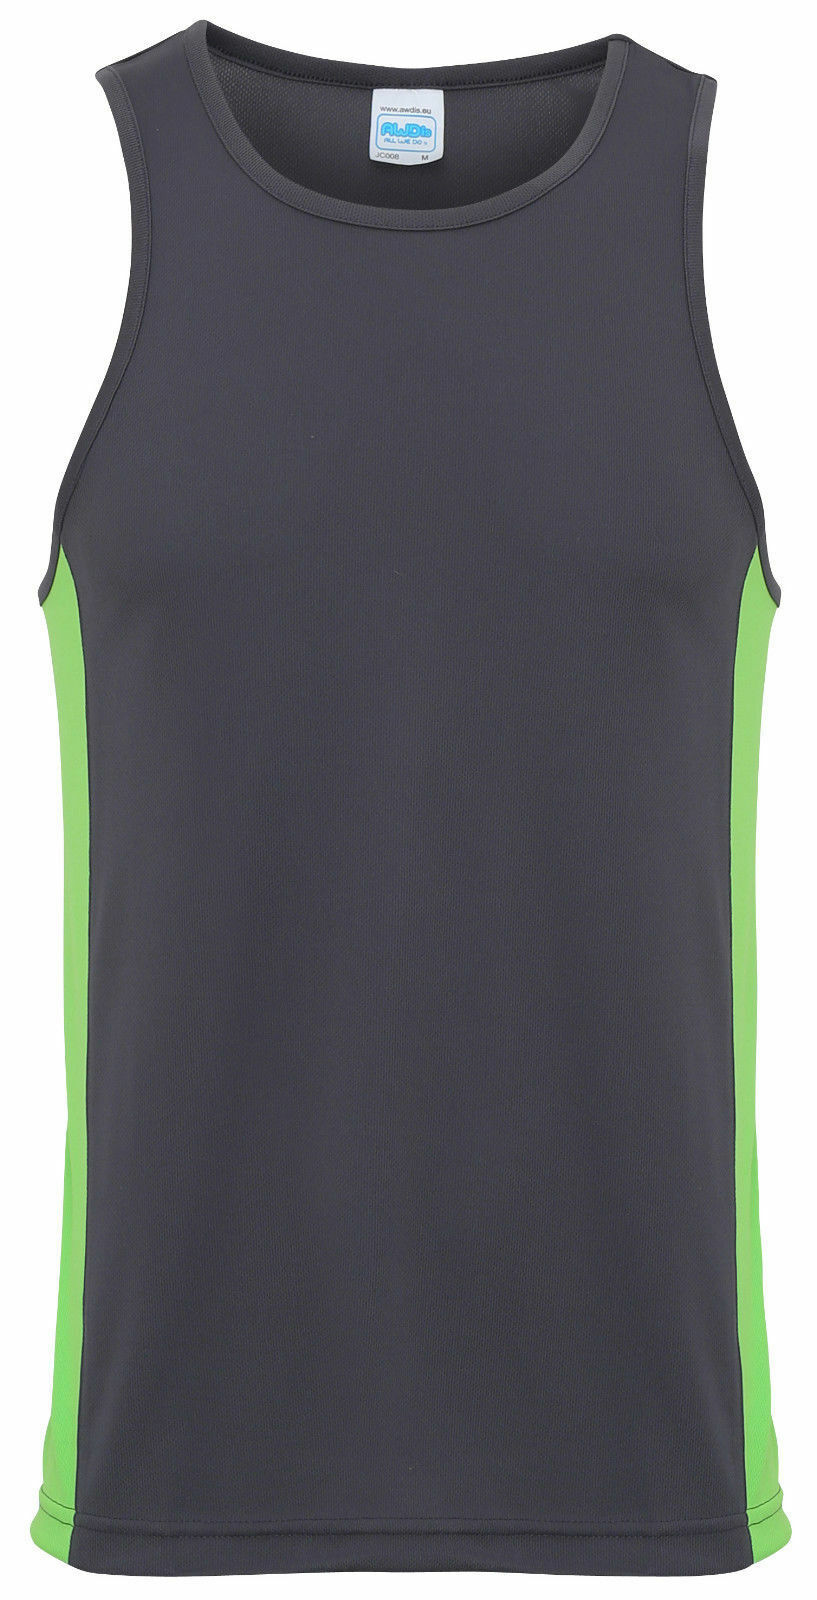 JC00 Cool Performance Vest